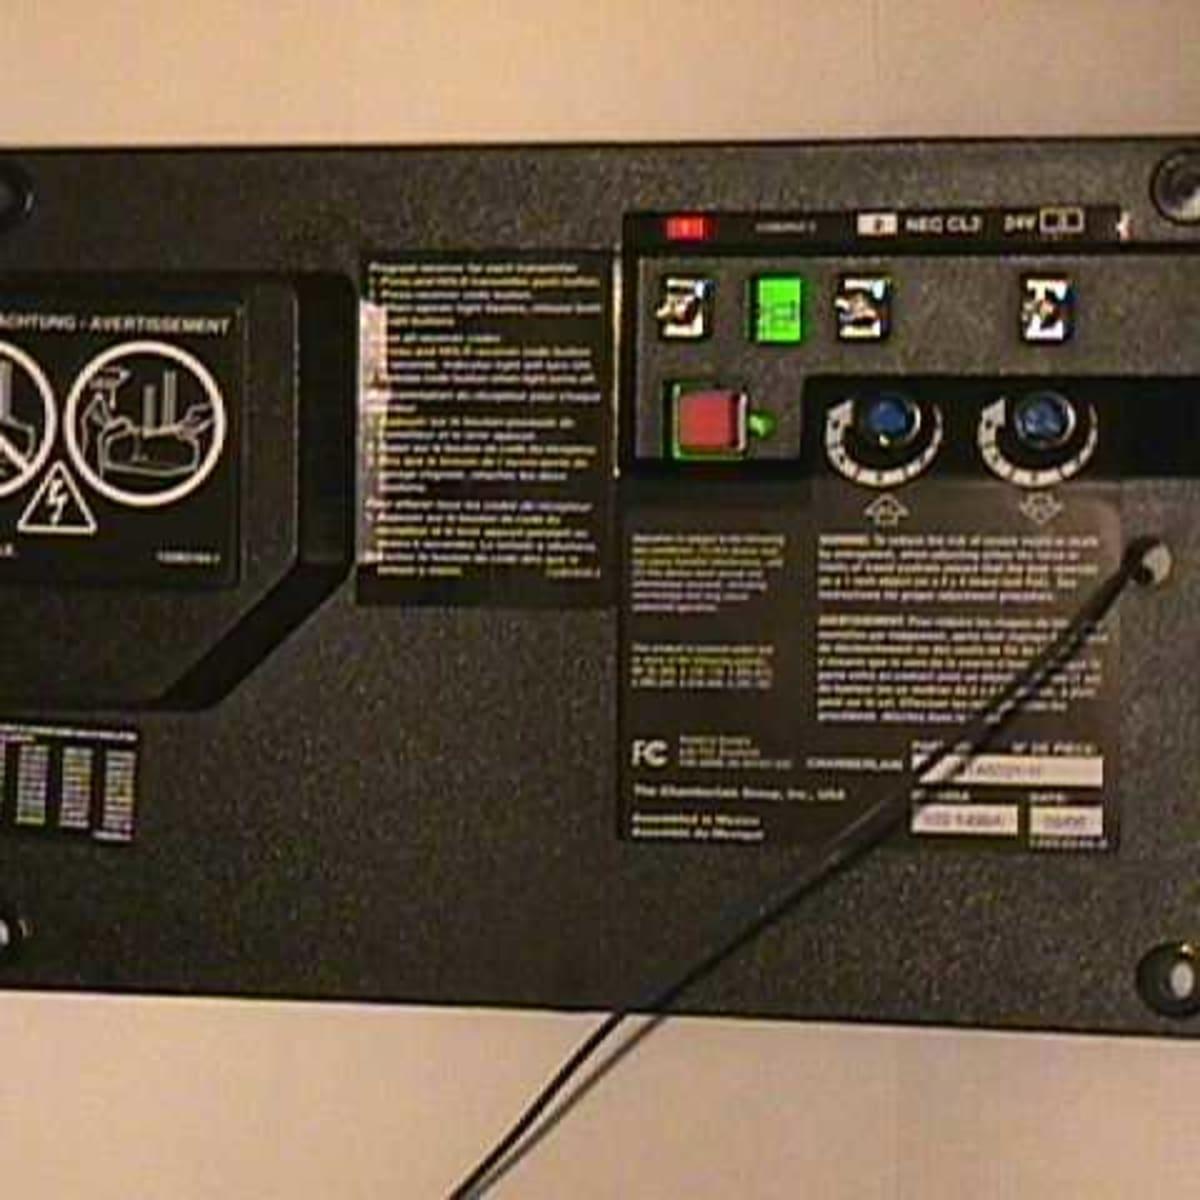 How To Program Your Garage Door Remote Control Hubpages